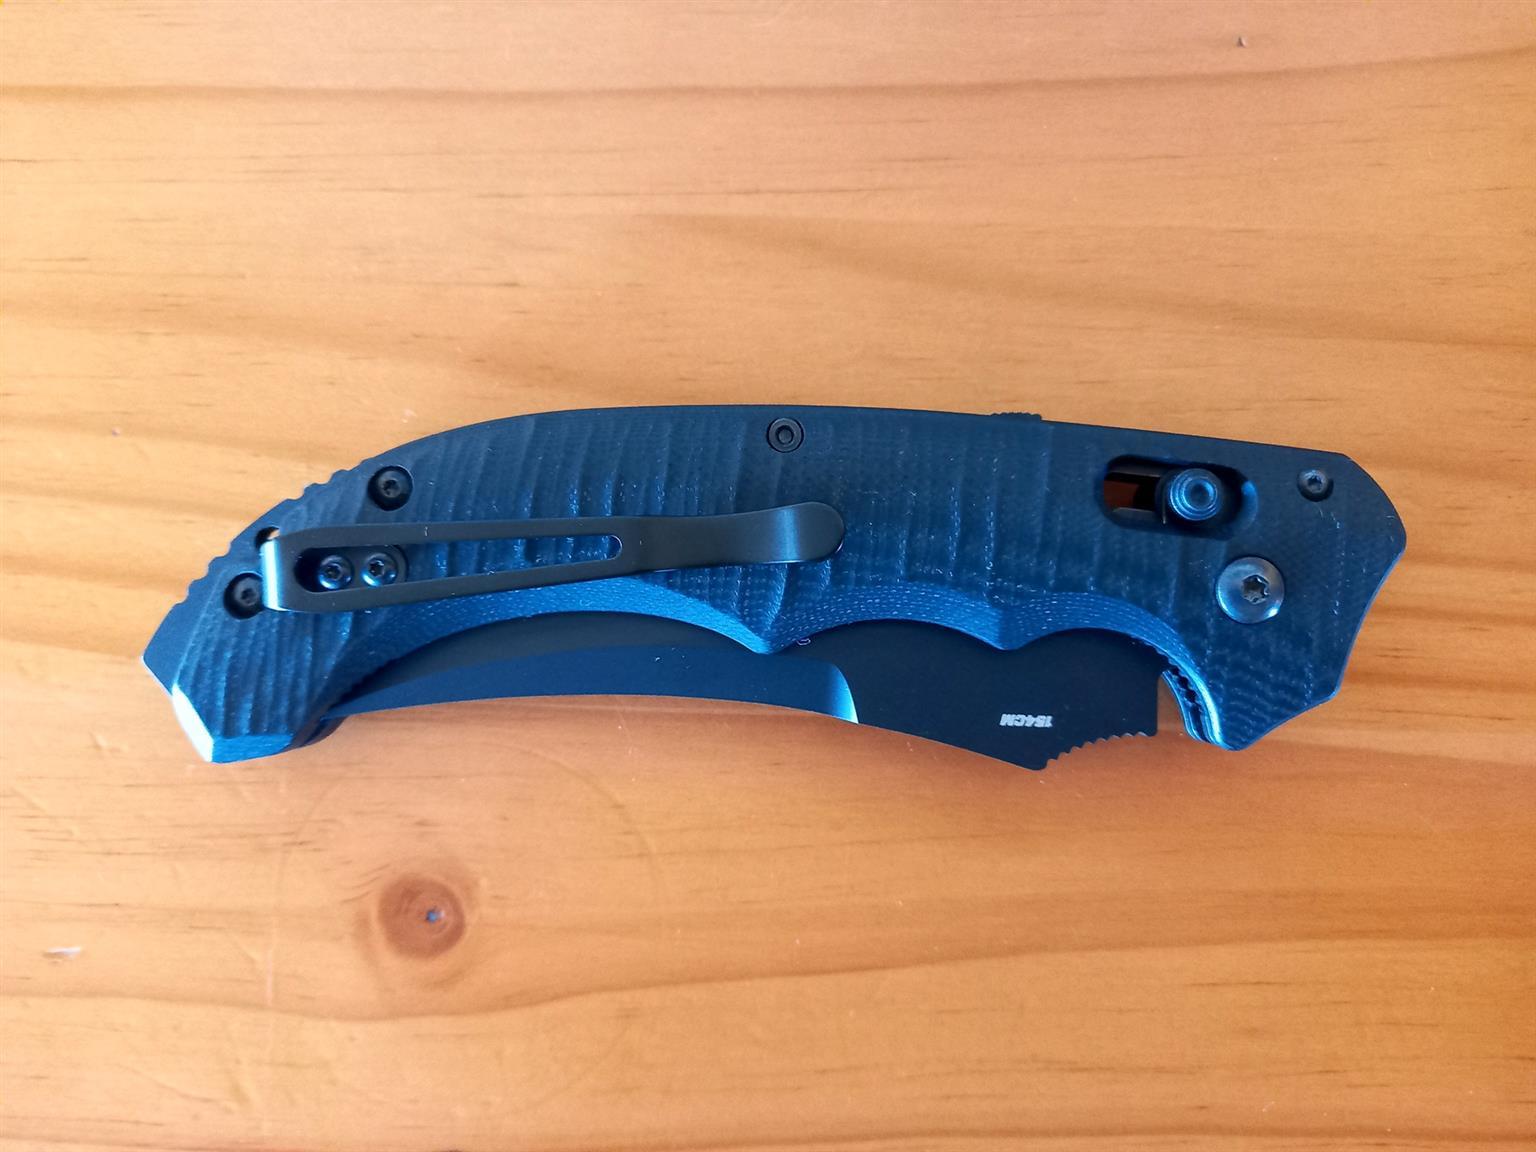 Benchmade Bedlam – 154CM – Tactical Auto Folding Knife